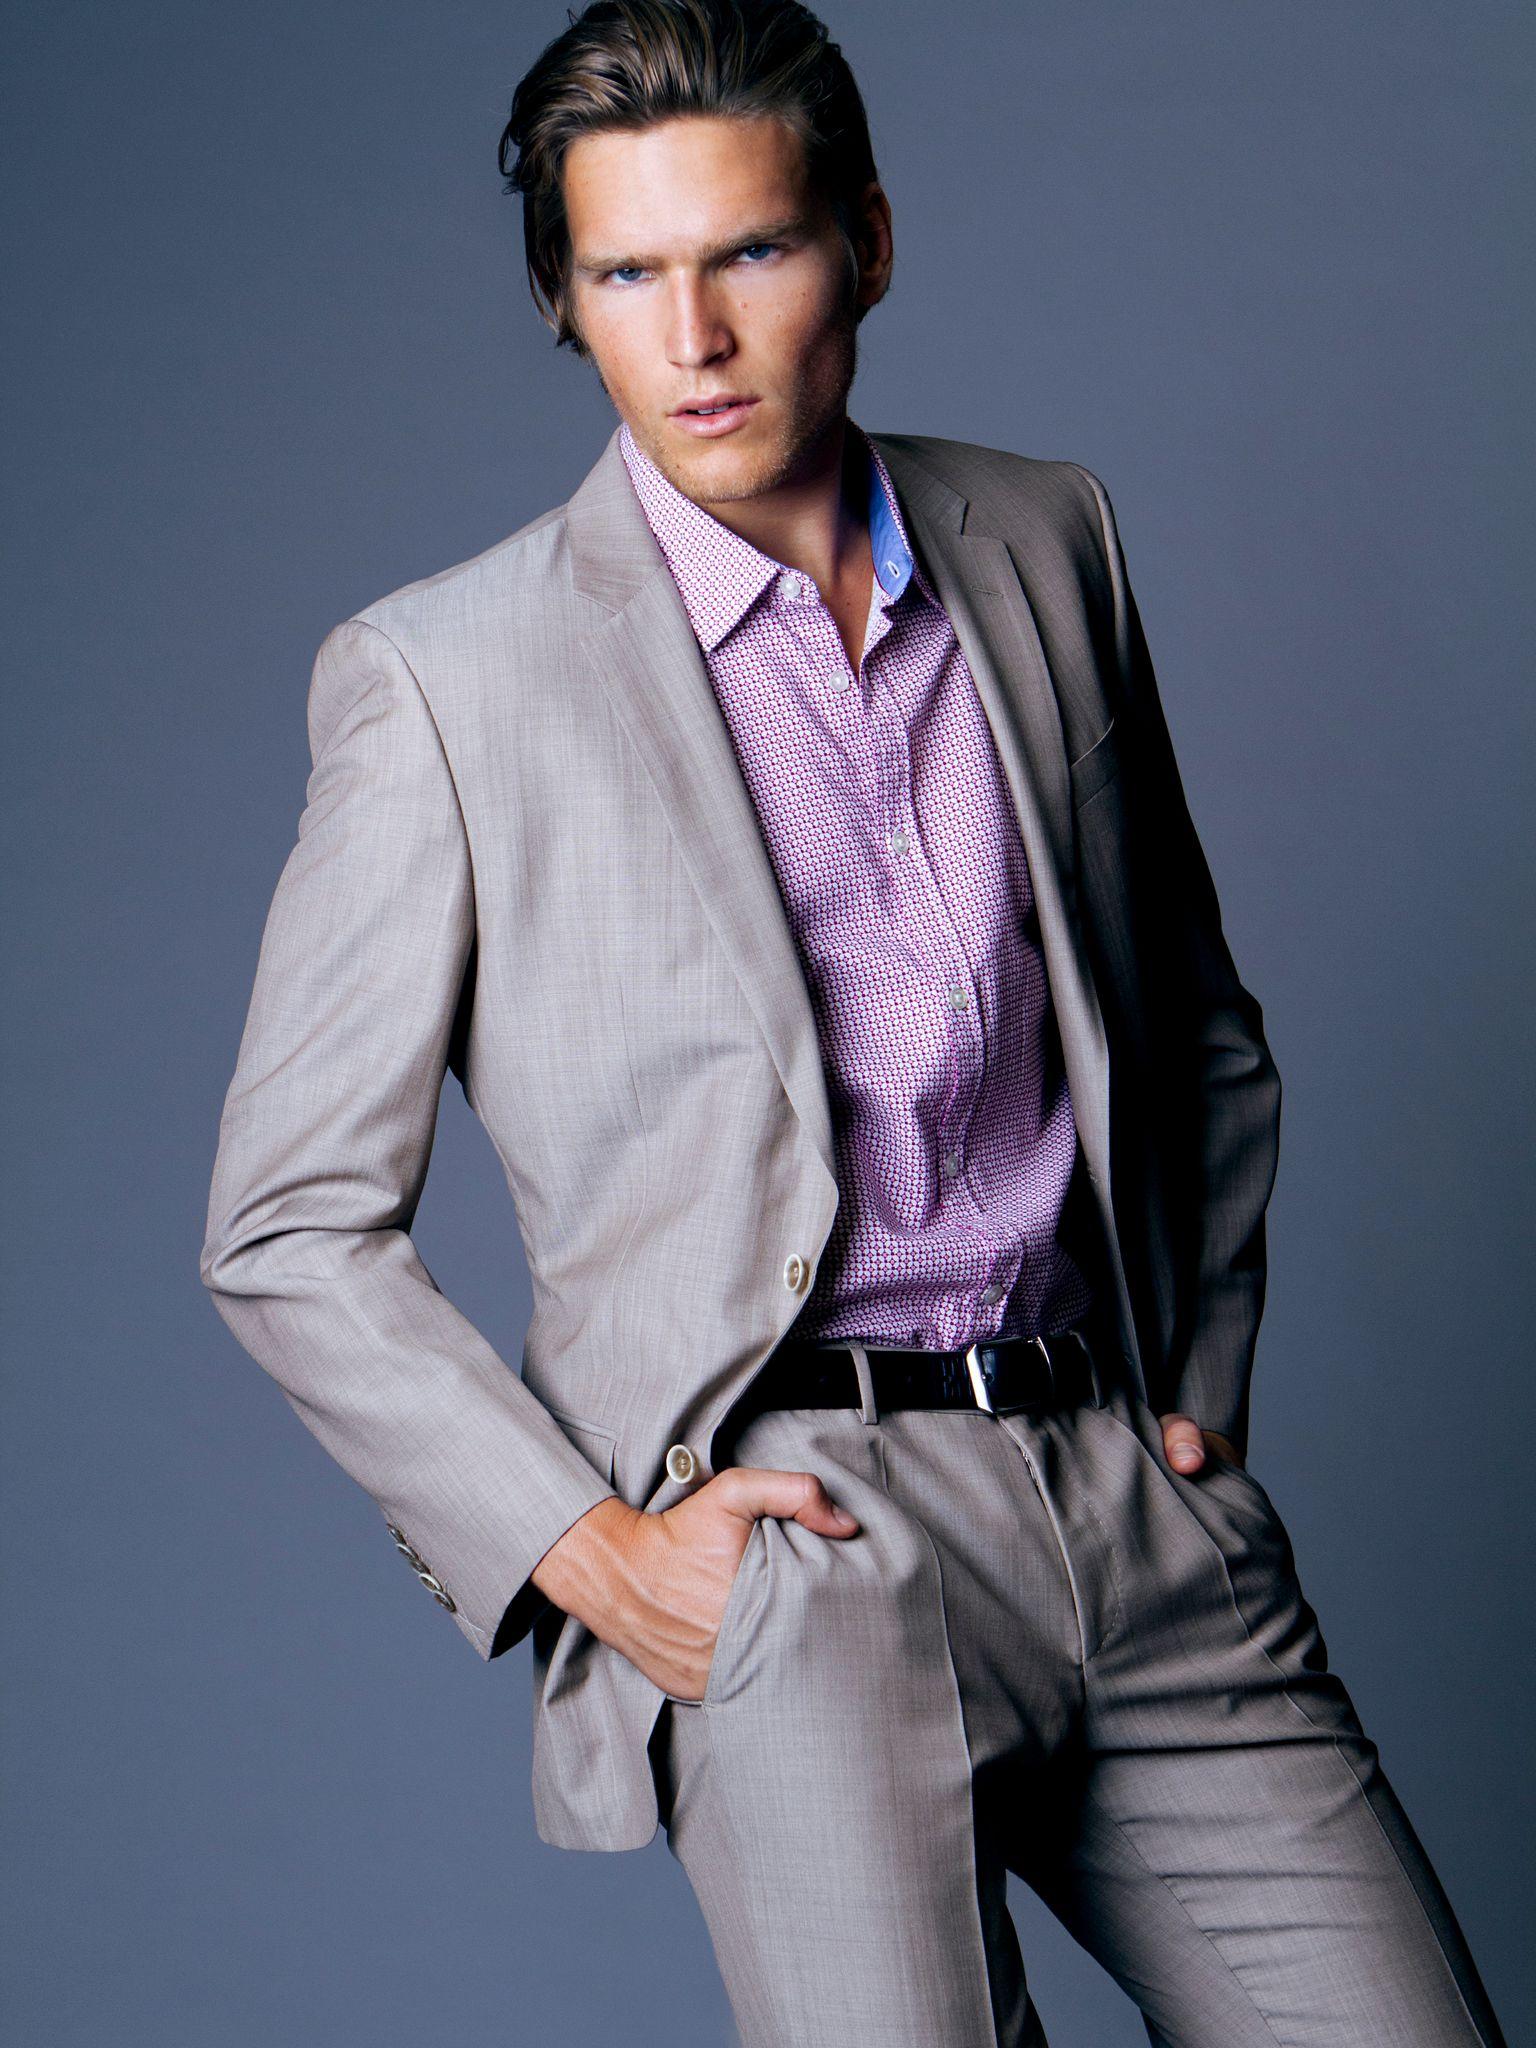 Male Model Moments: Meet Ryan Mertz - Daily Front Row